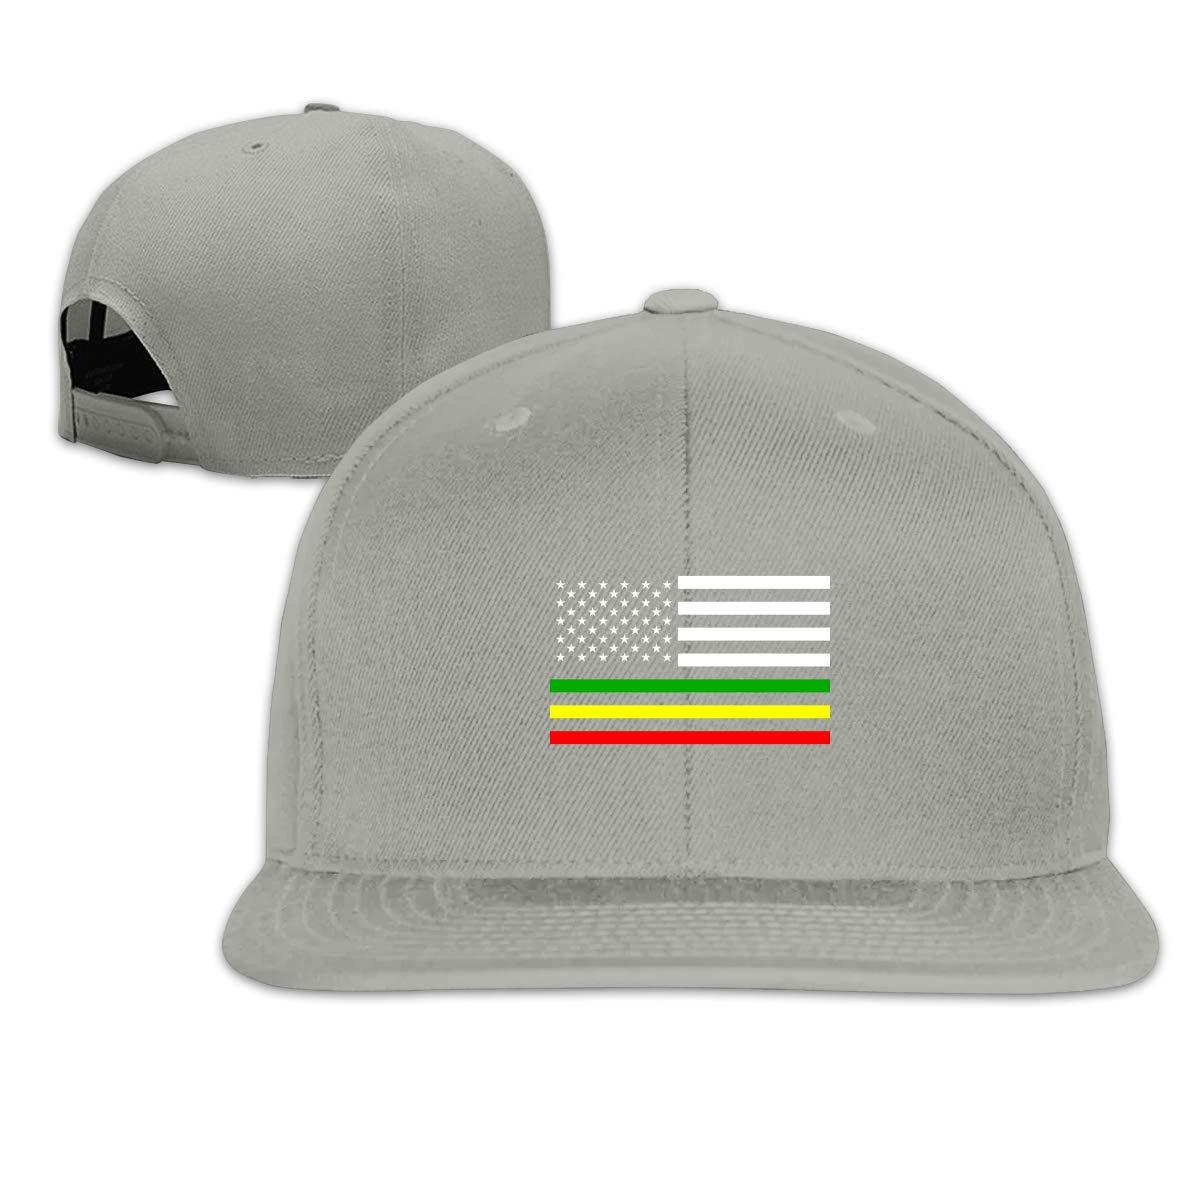 MOCSTONE Unisex Snapback Hat Rasta American Flag Adjustable Baseball Cap